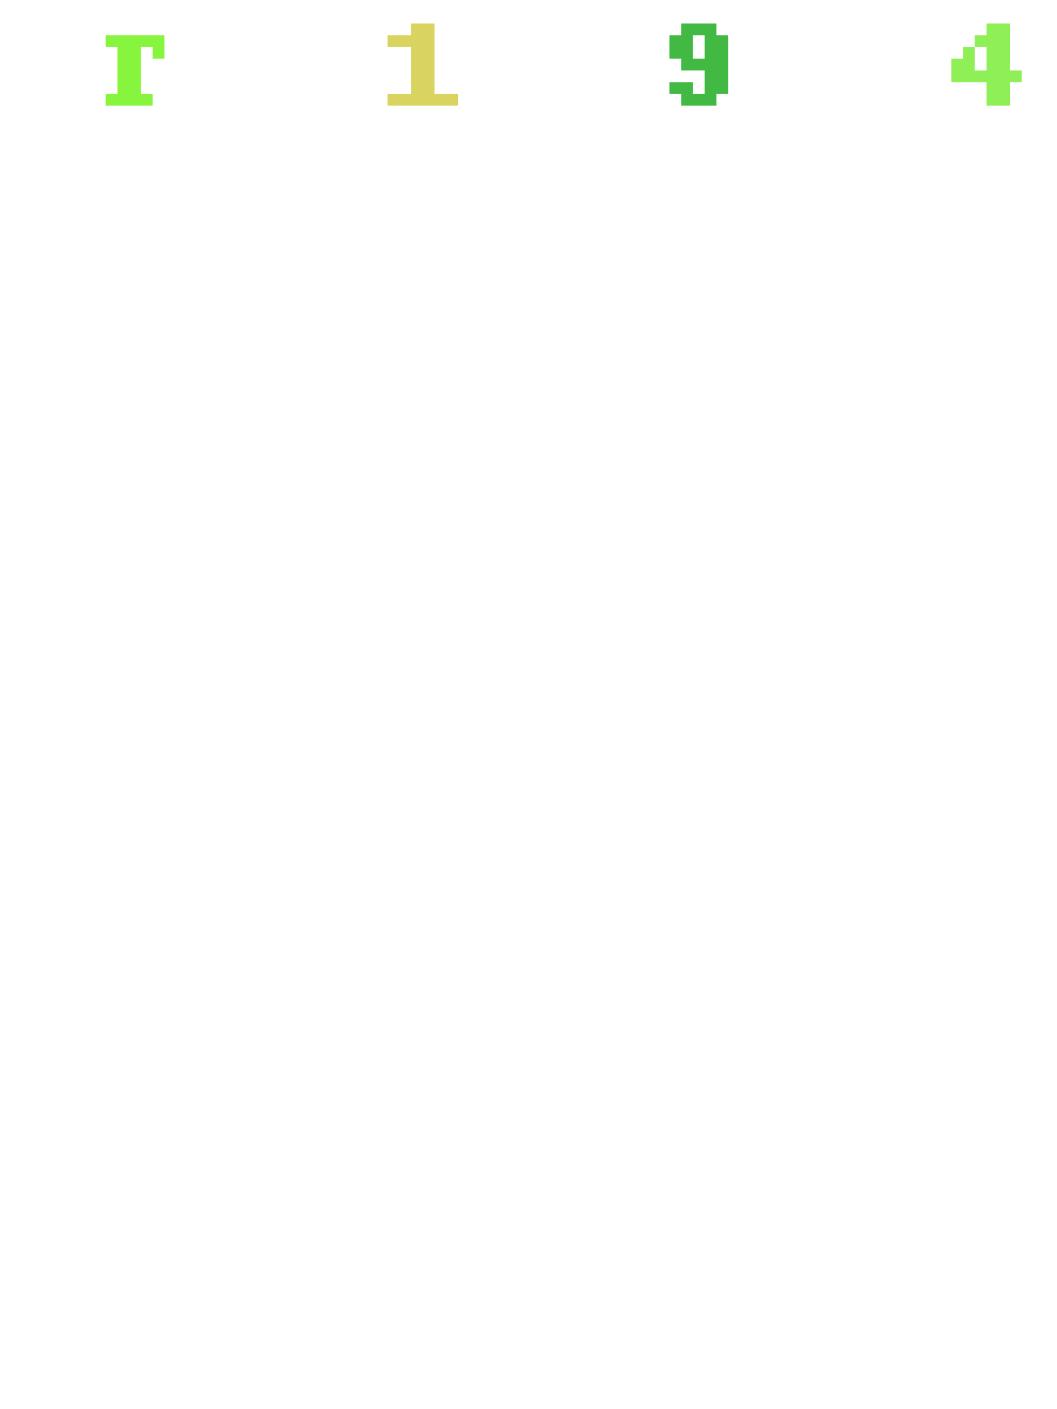 Strada e piramide a San Francisco